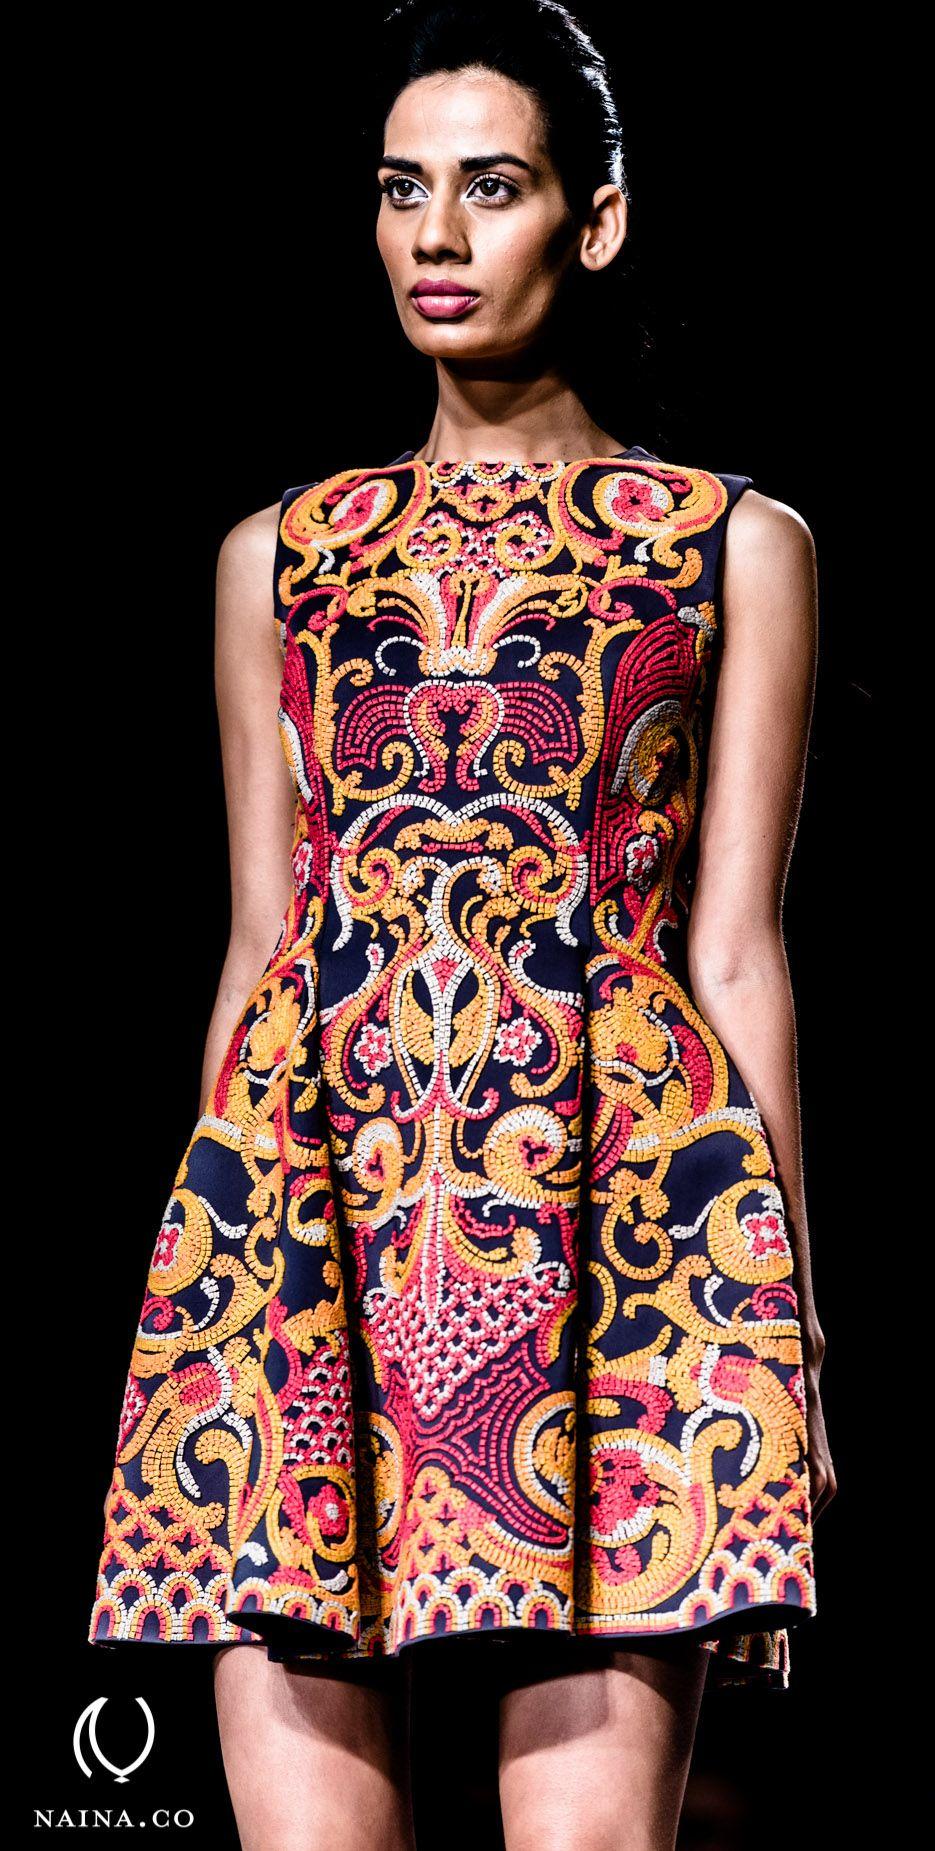 Pin by Naina.co on #EyesForFashion | Fashion, India ...